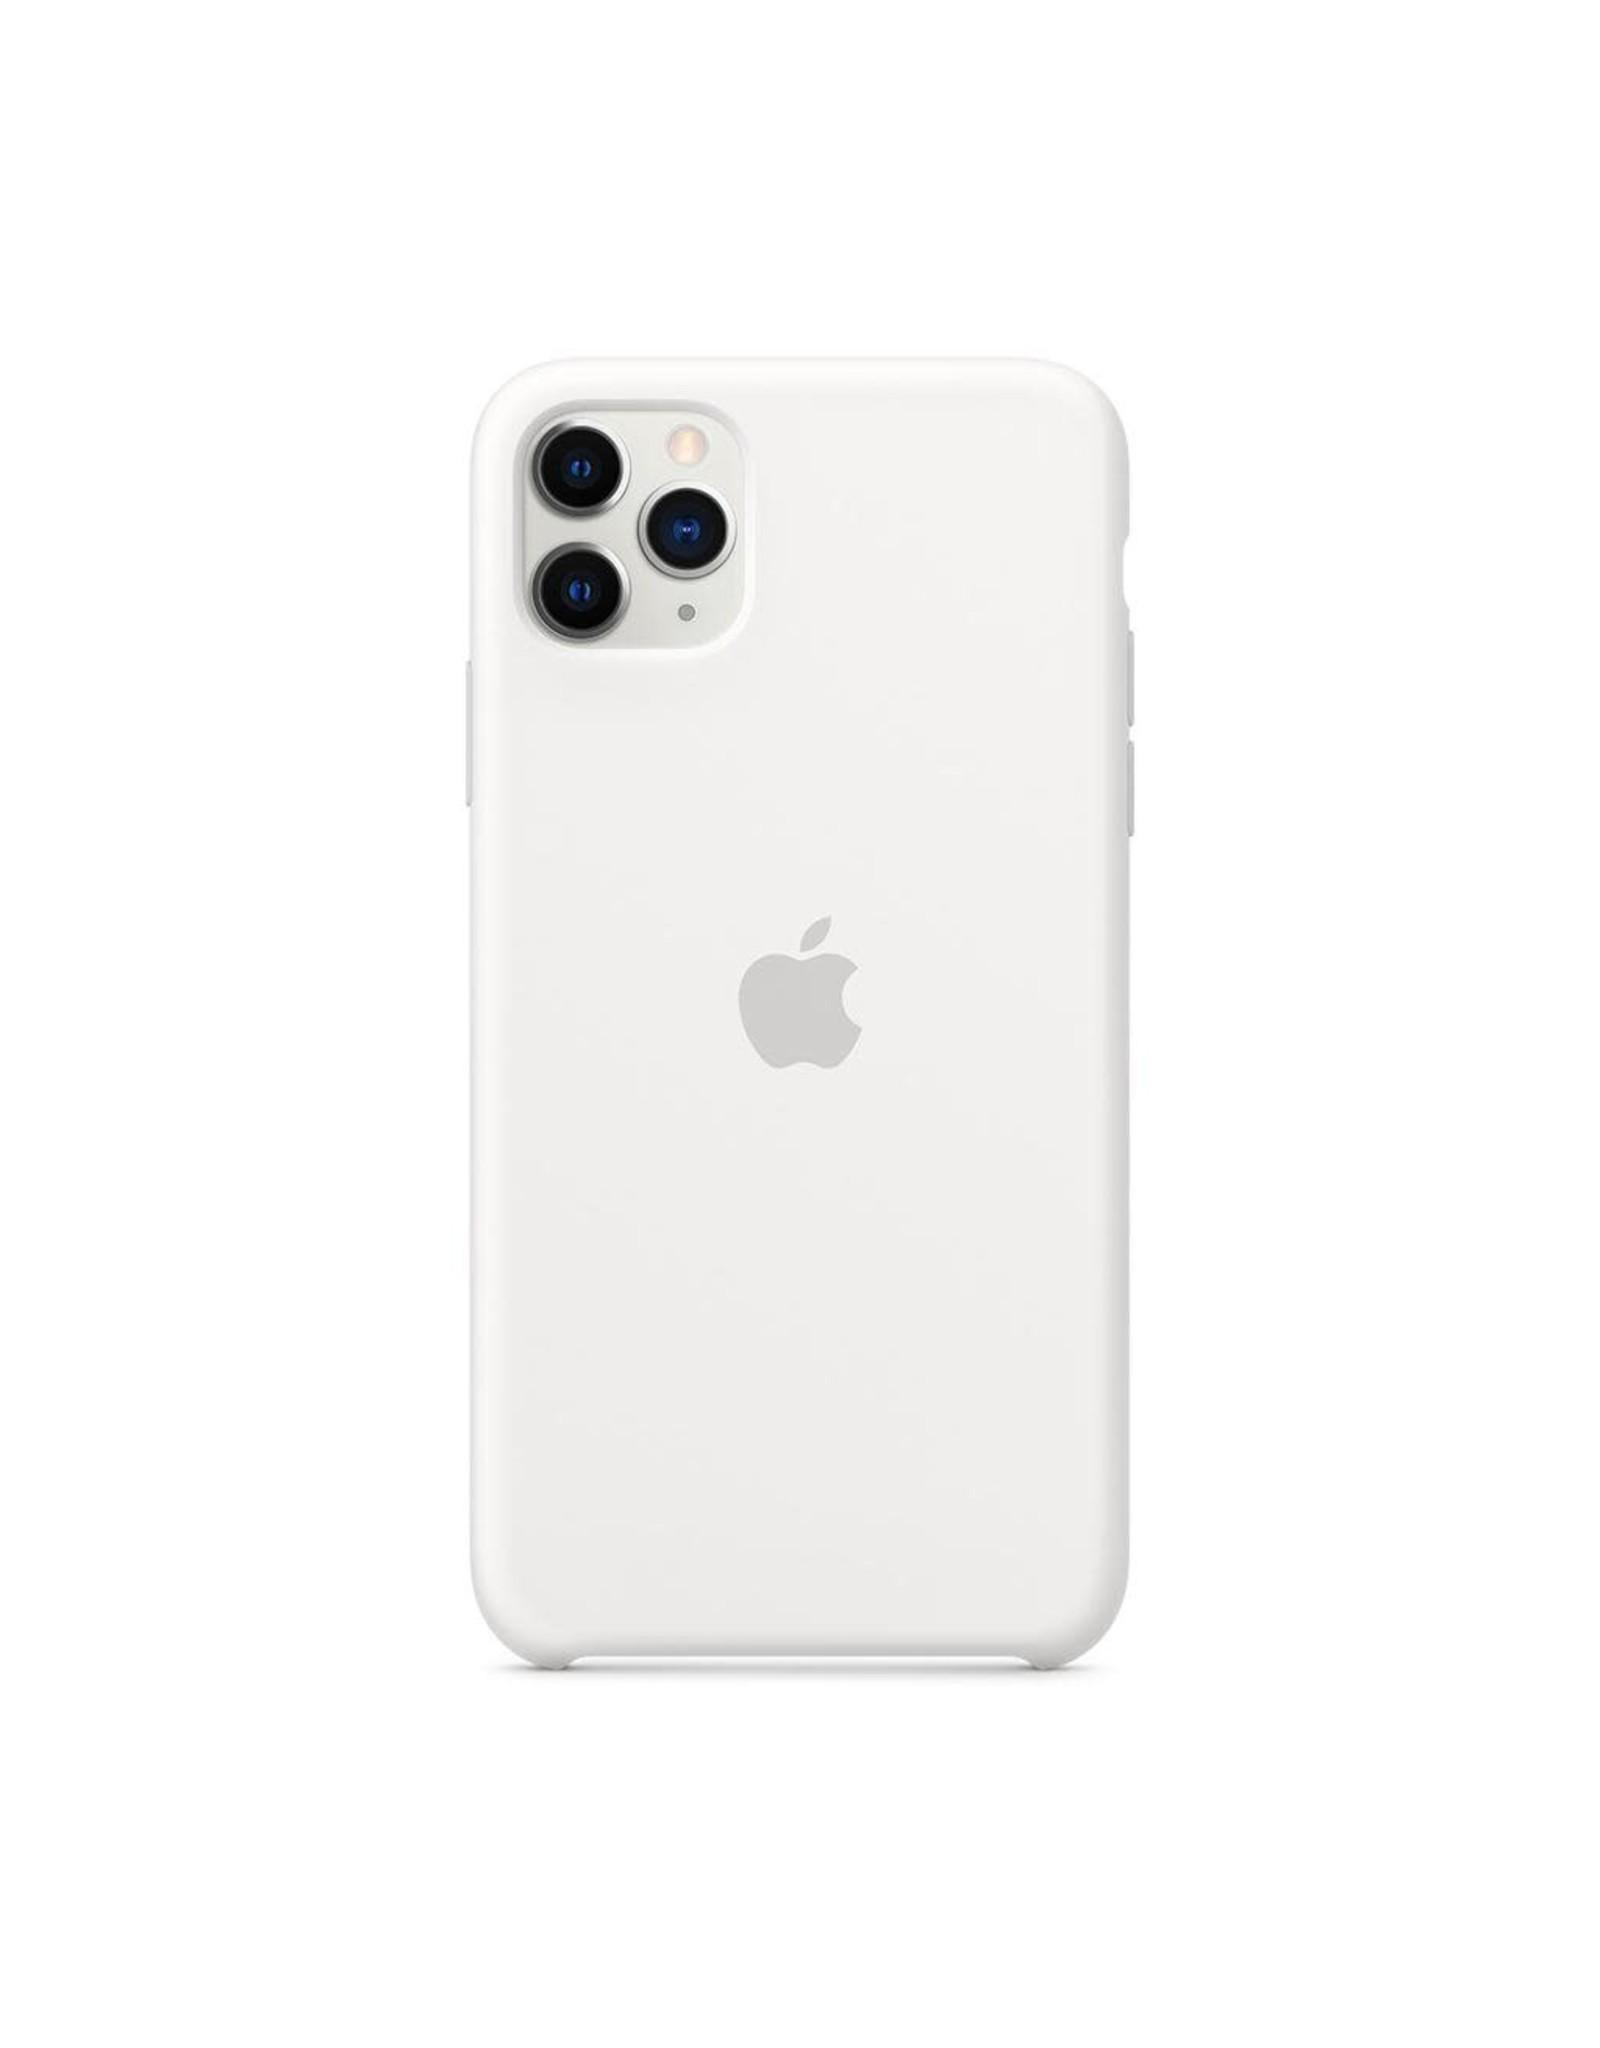 Apple Apple iPhone 11 Pro Max Silicone Case - WHITE